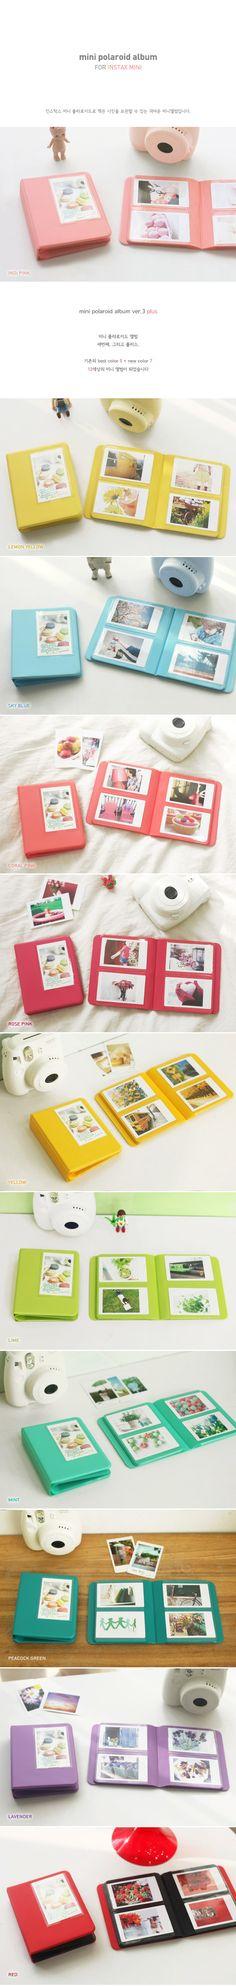 New Polaroid Photo Album for Fuji Instax Mini Ver 3 Plus Indi Pink | eBay $8.99